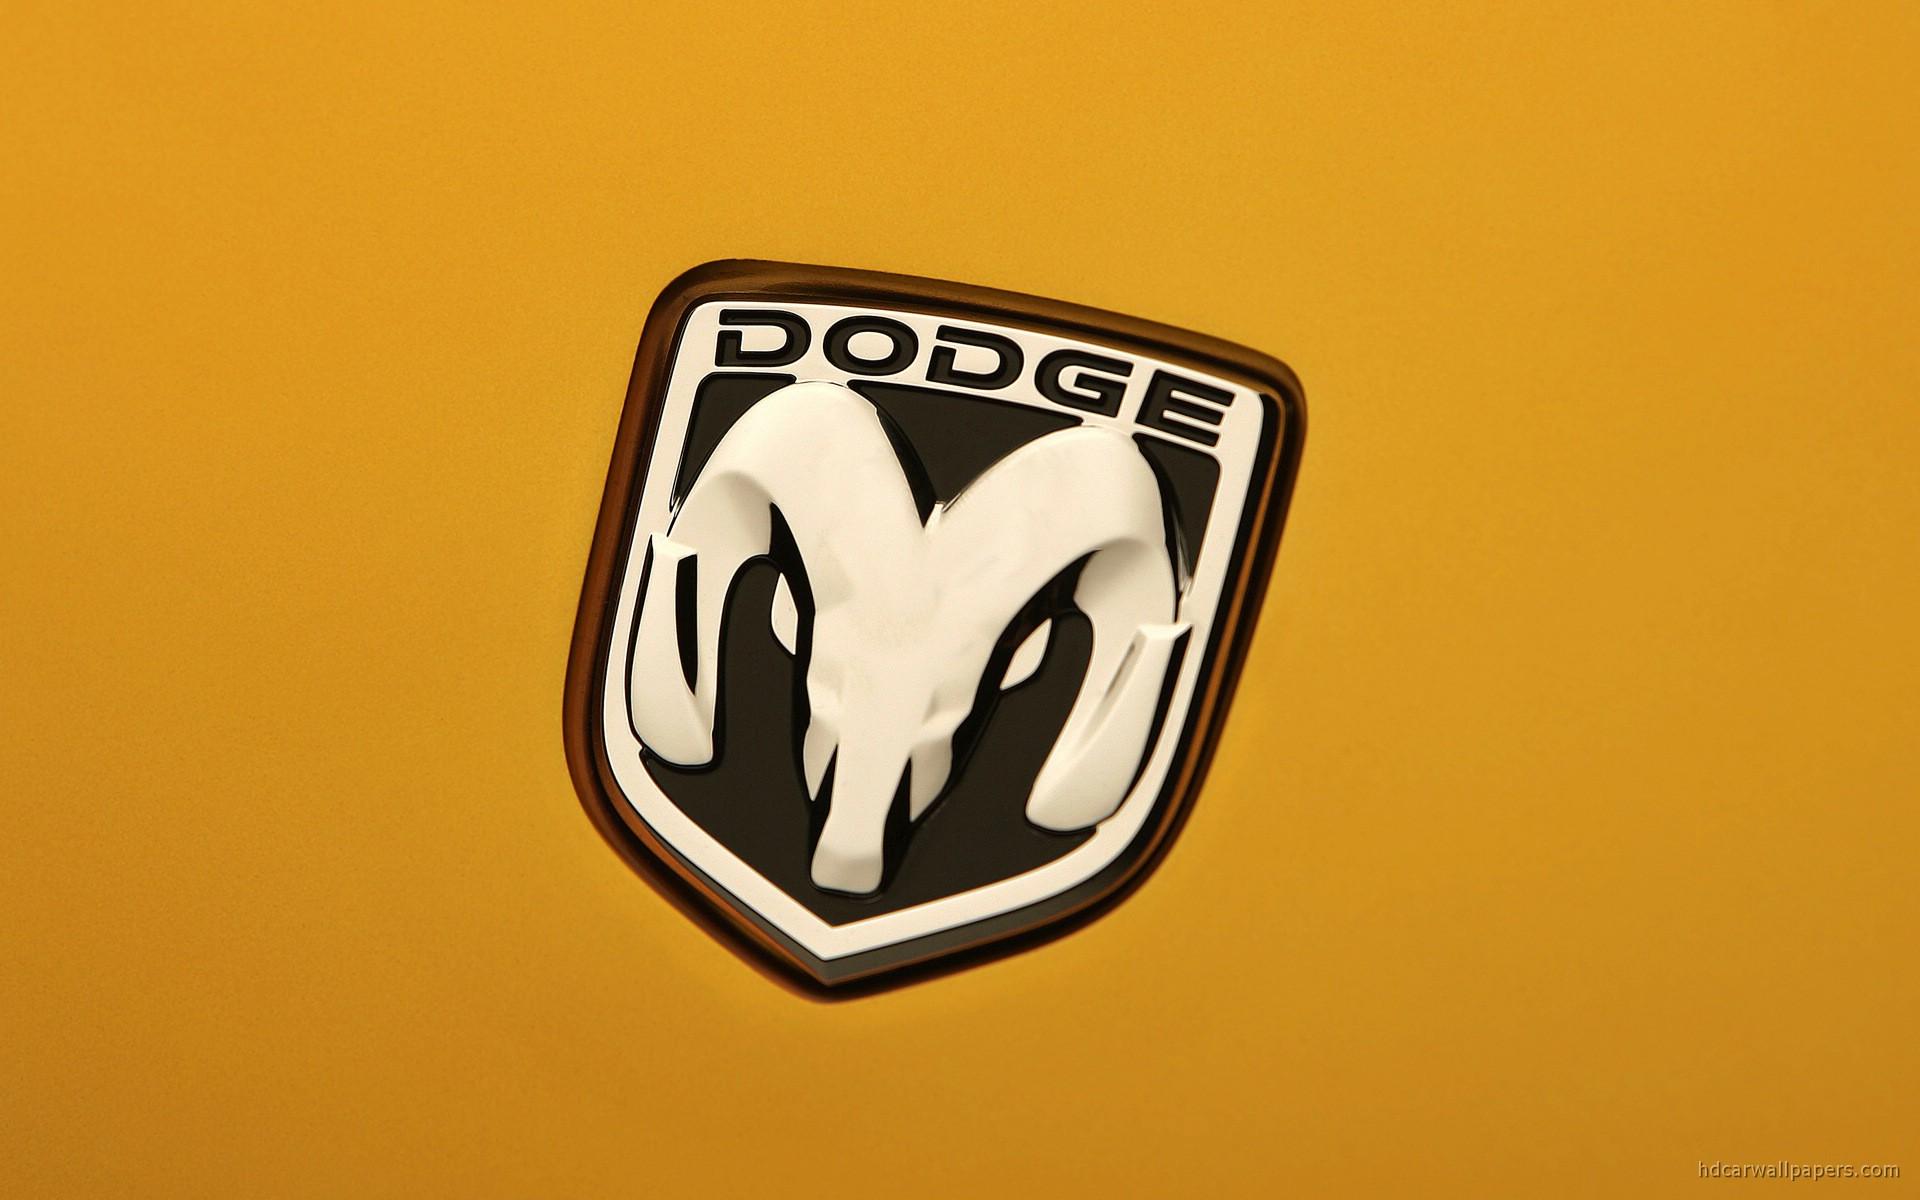 Hd wallpaper logo - Dodge Car Logo Wallpaper Hd Car Wallpapers